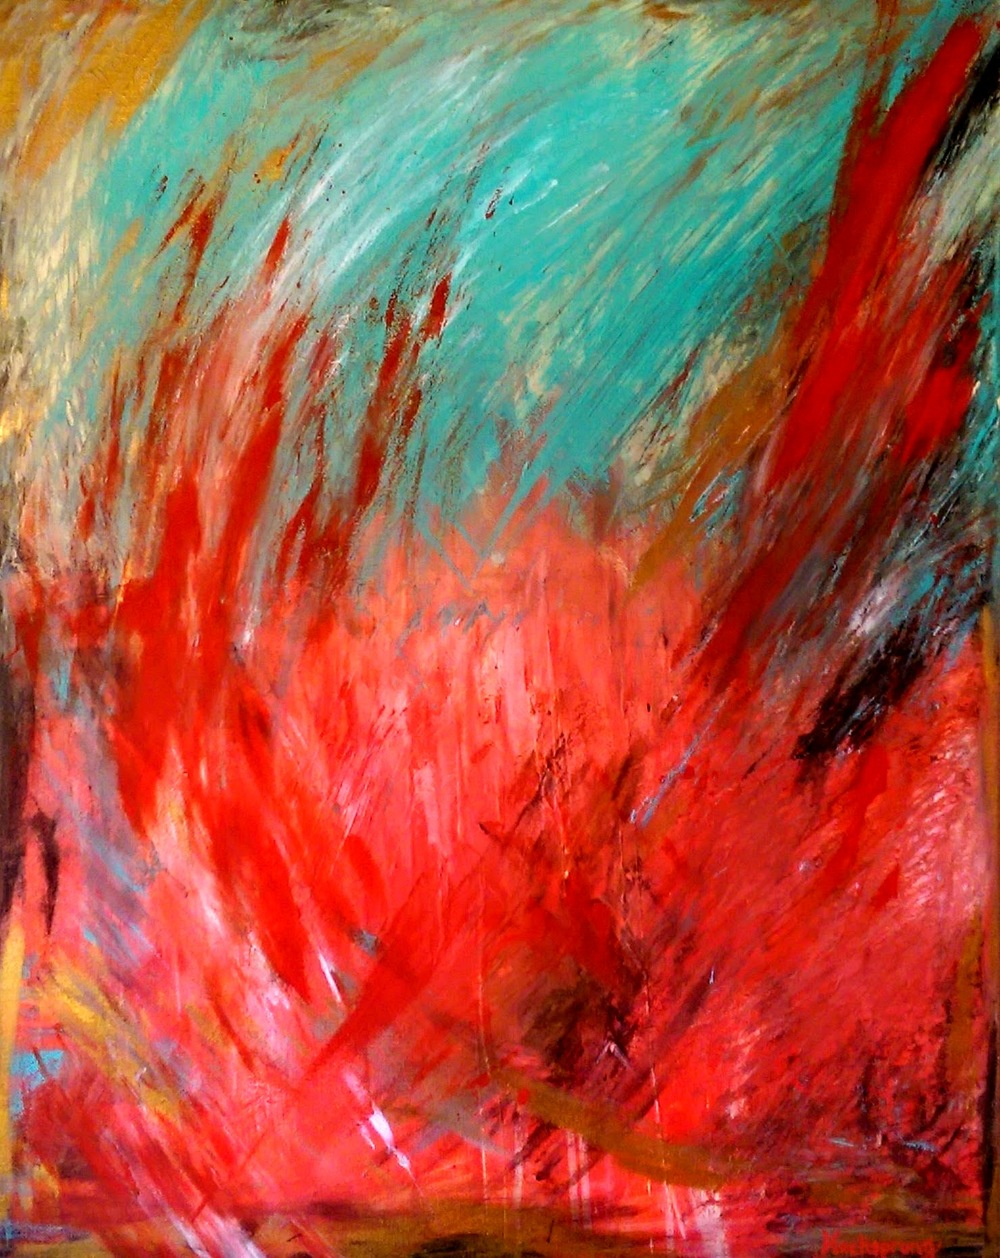 World on Fire, 2015 by Gina Hochsprung.jpg